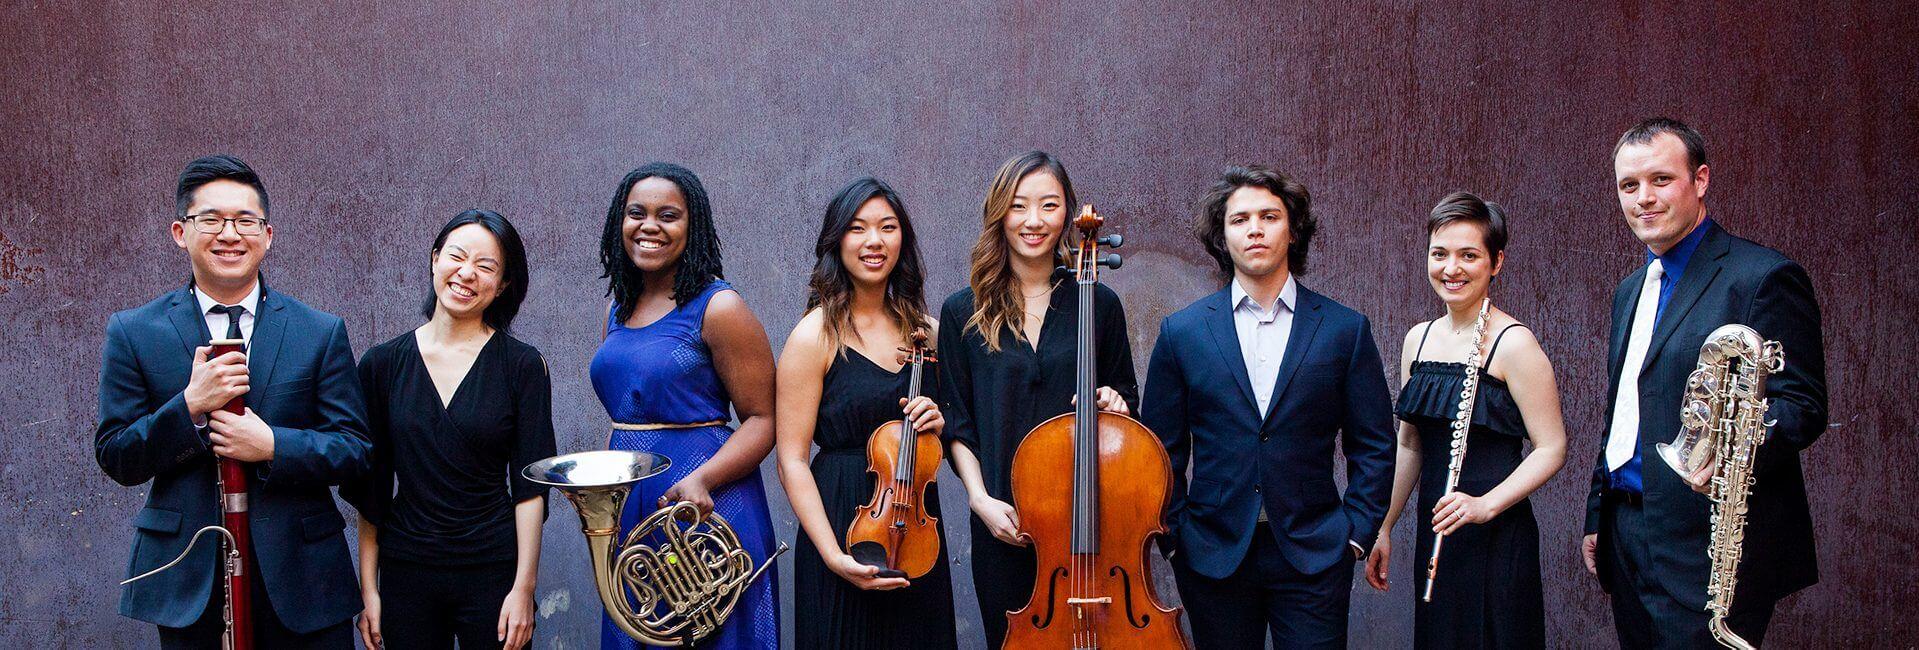 Performance-Ensembles-Header-UCLA